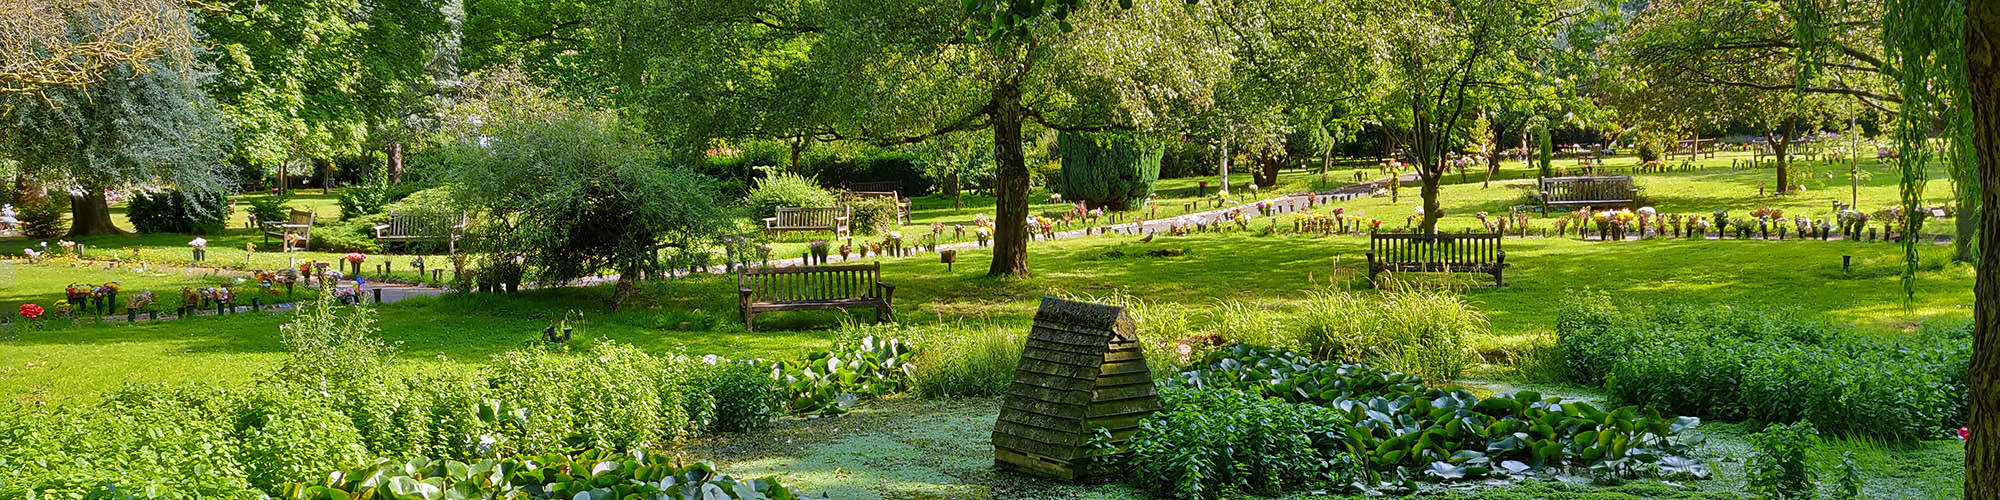 pond and gardens 1 2000x500